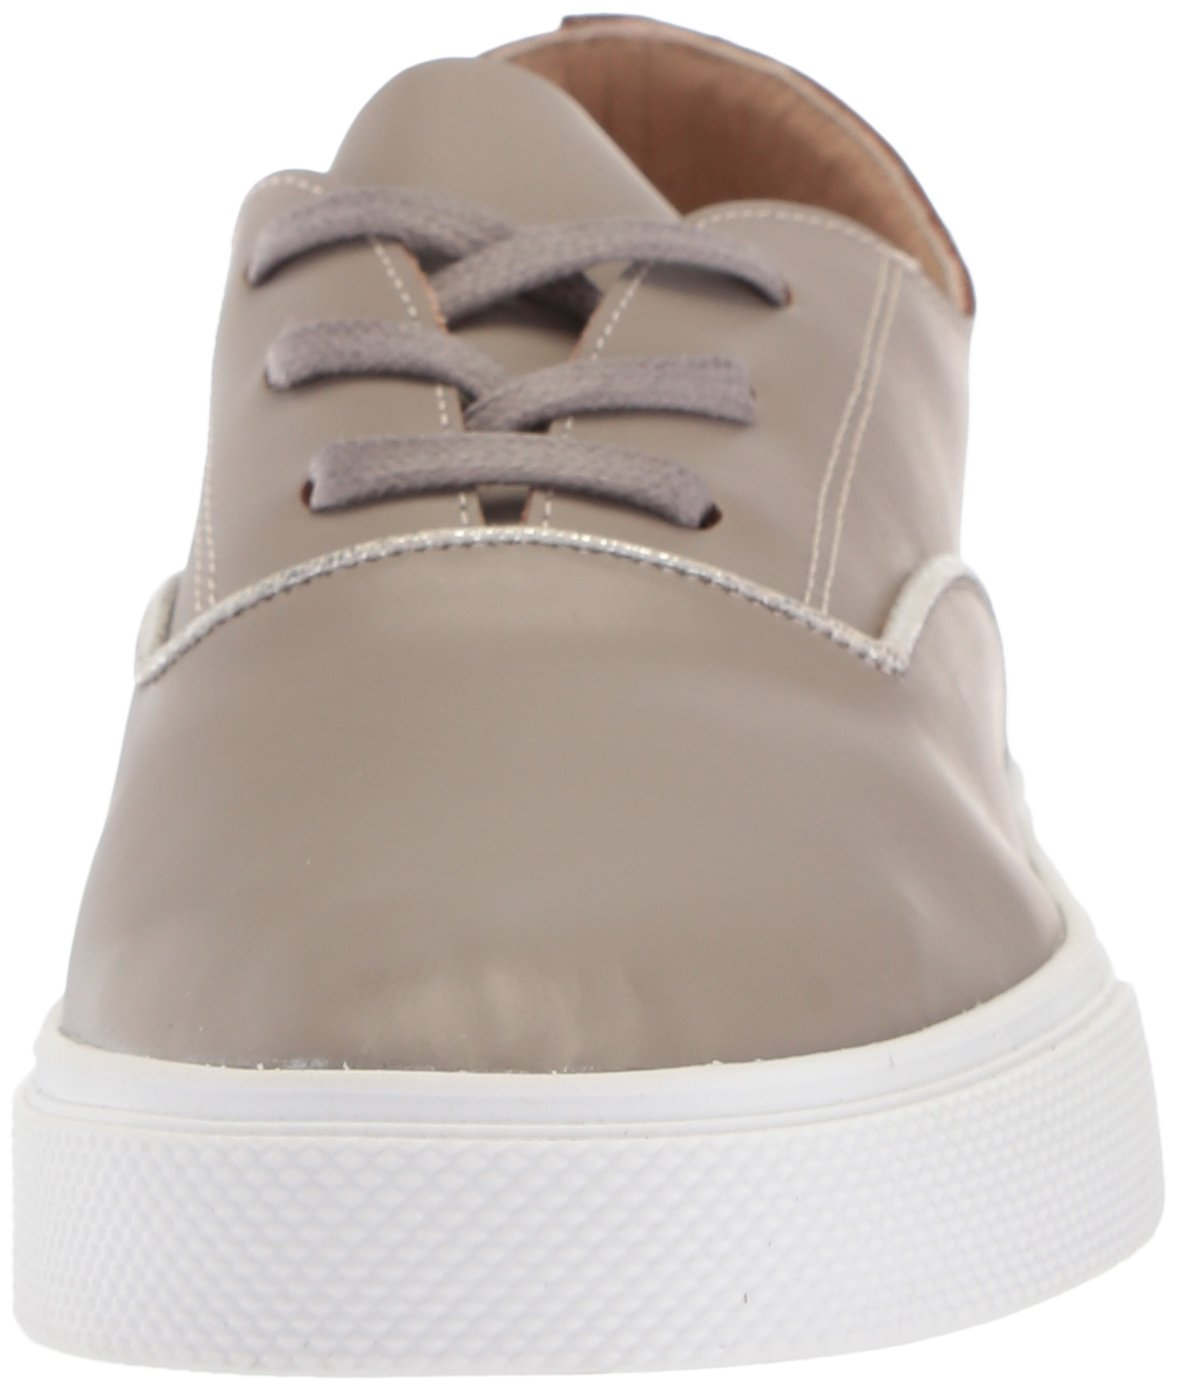 KAANAS Sneaker Women's Varadero Lace-up Fashion Sneaker KAANAS B076FLW2WL 7 B(M) US|Ash 194aed